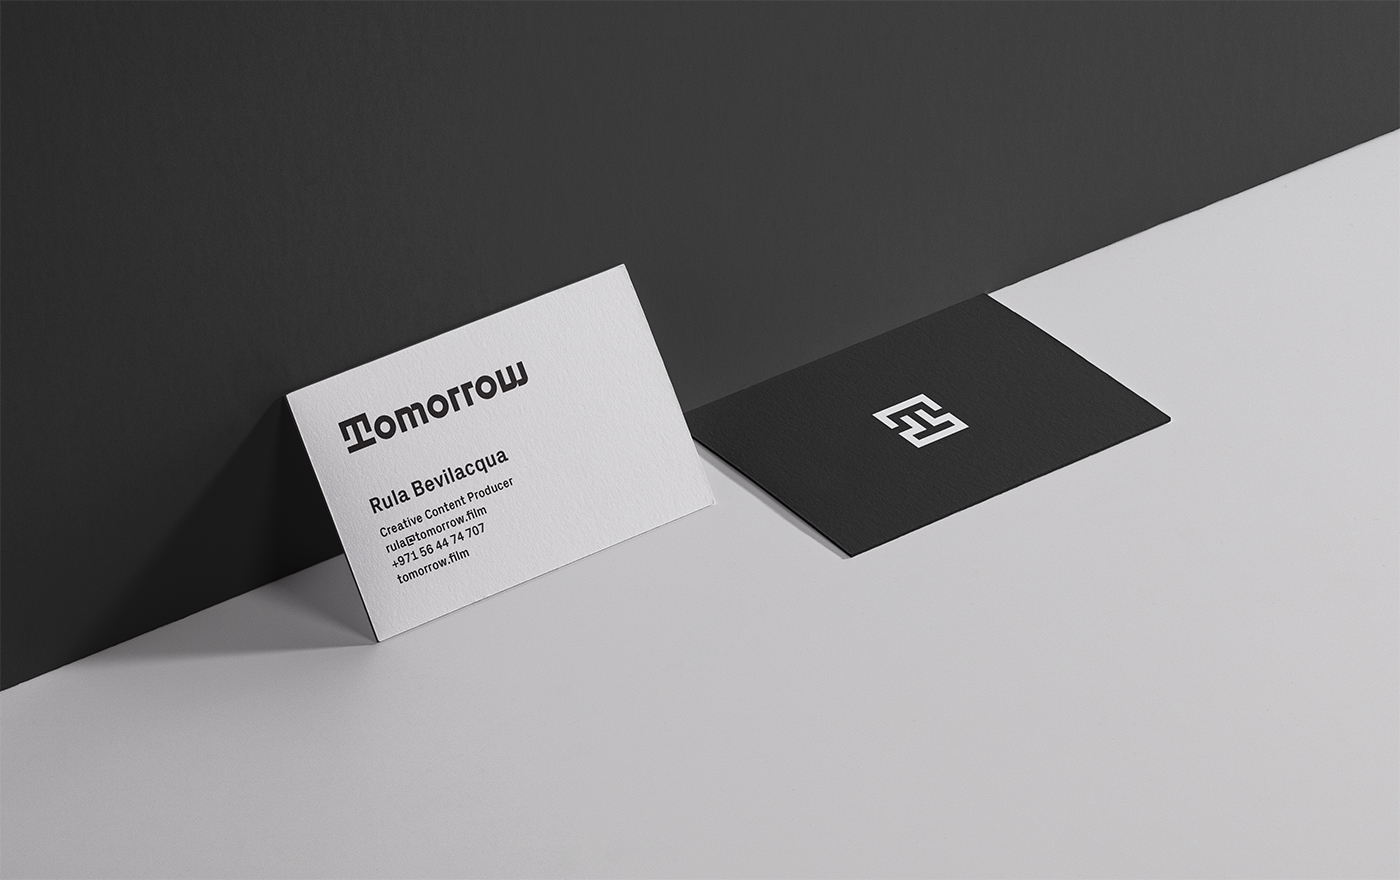 Tomorrow_cards.jpg